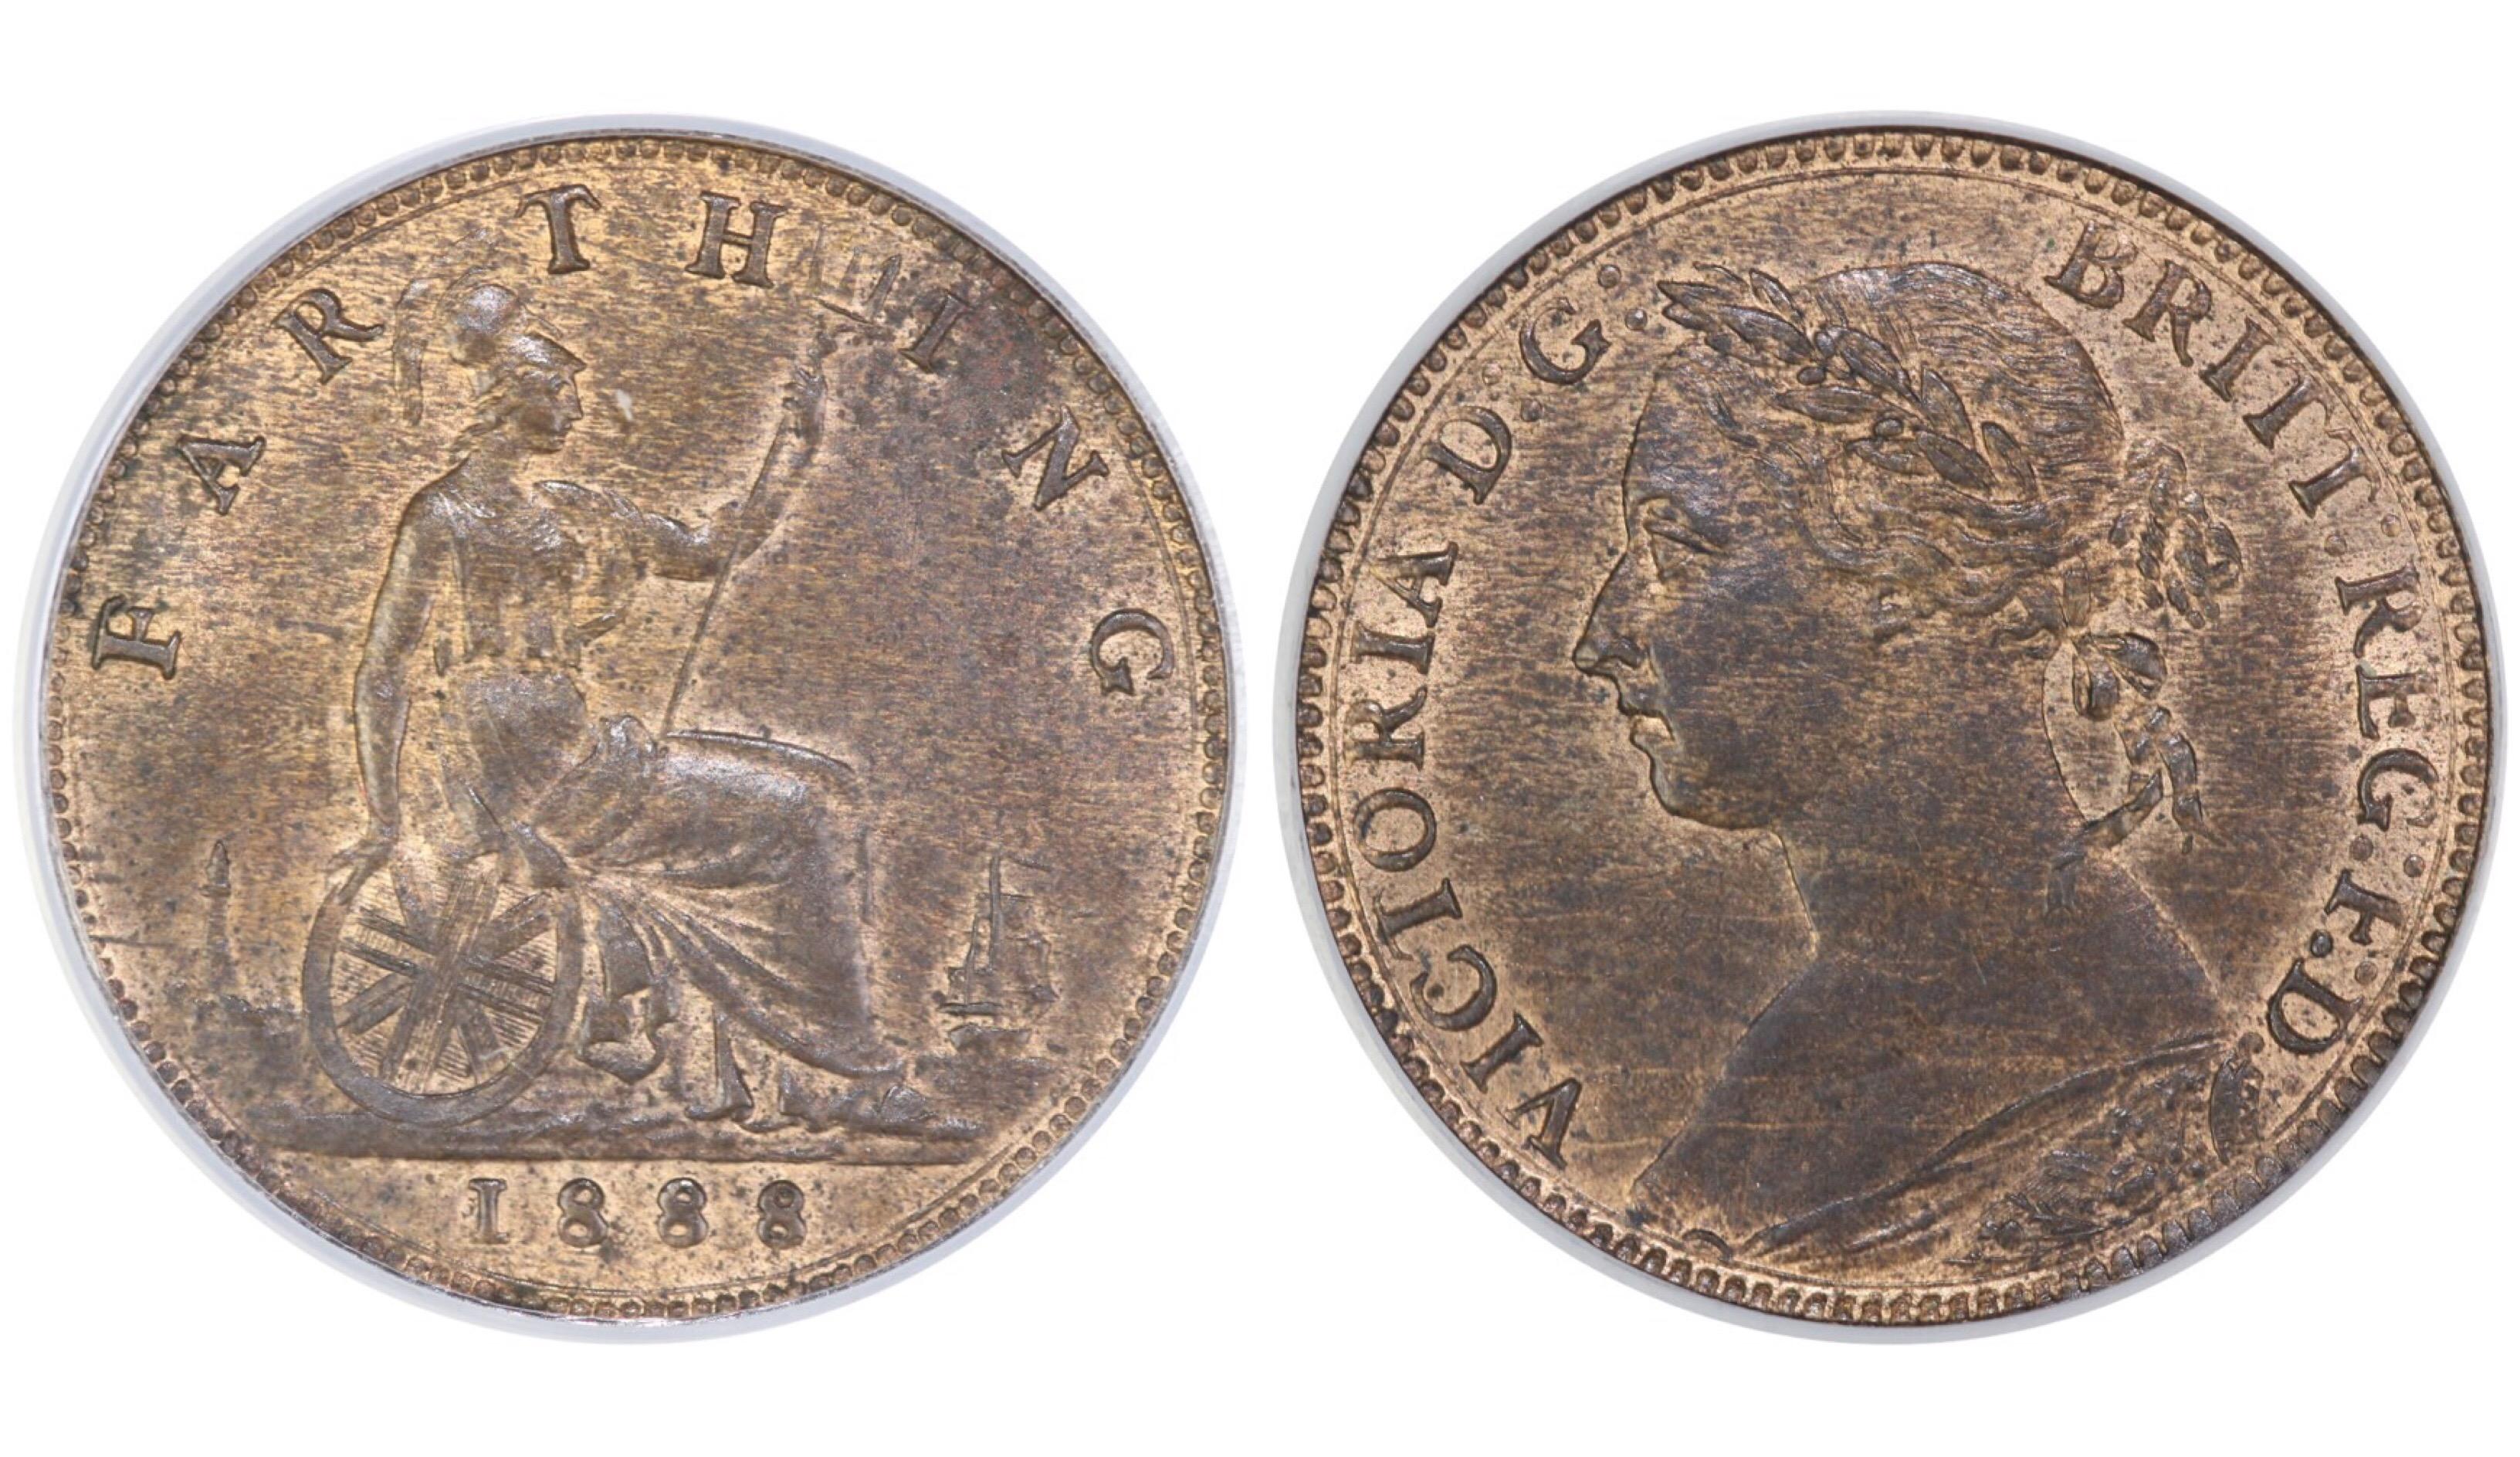 1888 Farthing, CGS 78, Victoria, Freeman 560, UIN 23890